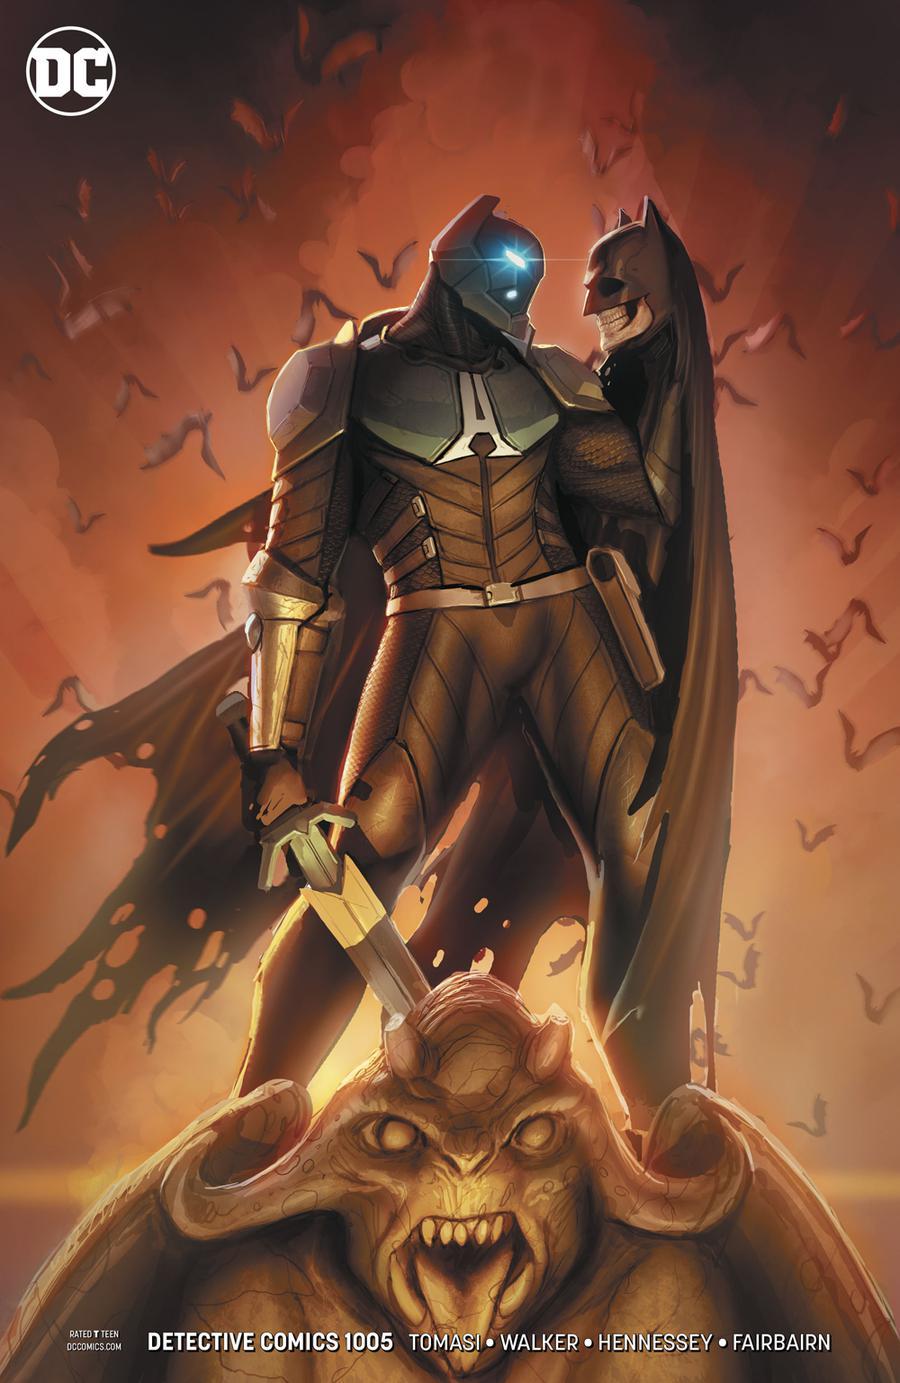 Detective Comics Vol 2 #1005 Cover B Variant Stjepan Sejic Cover